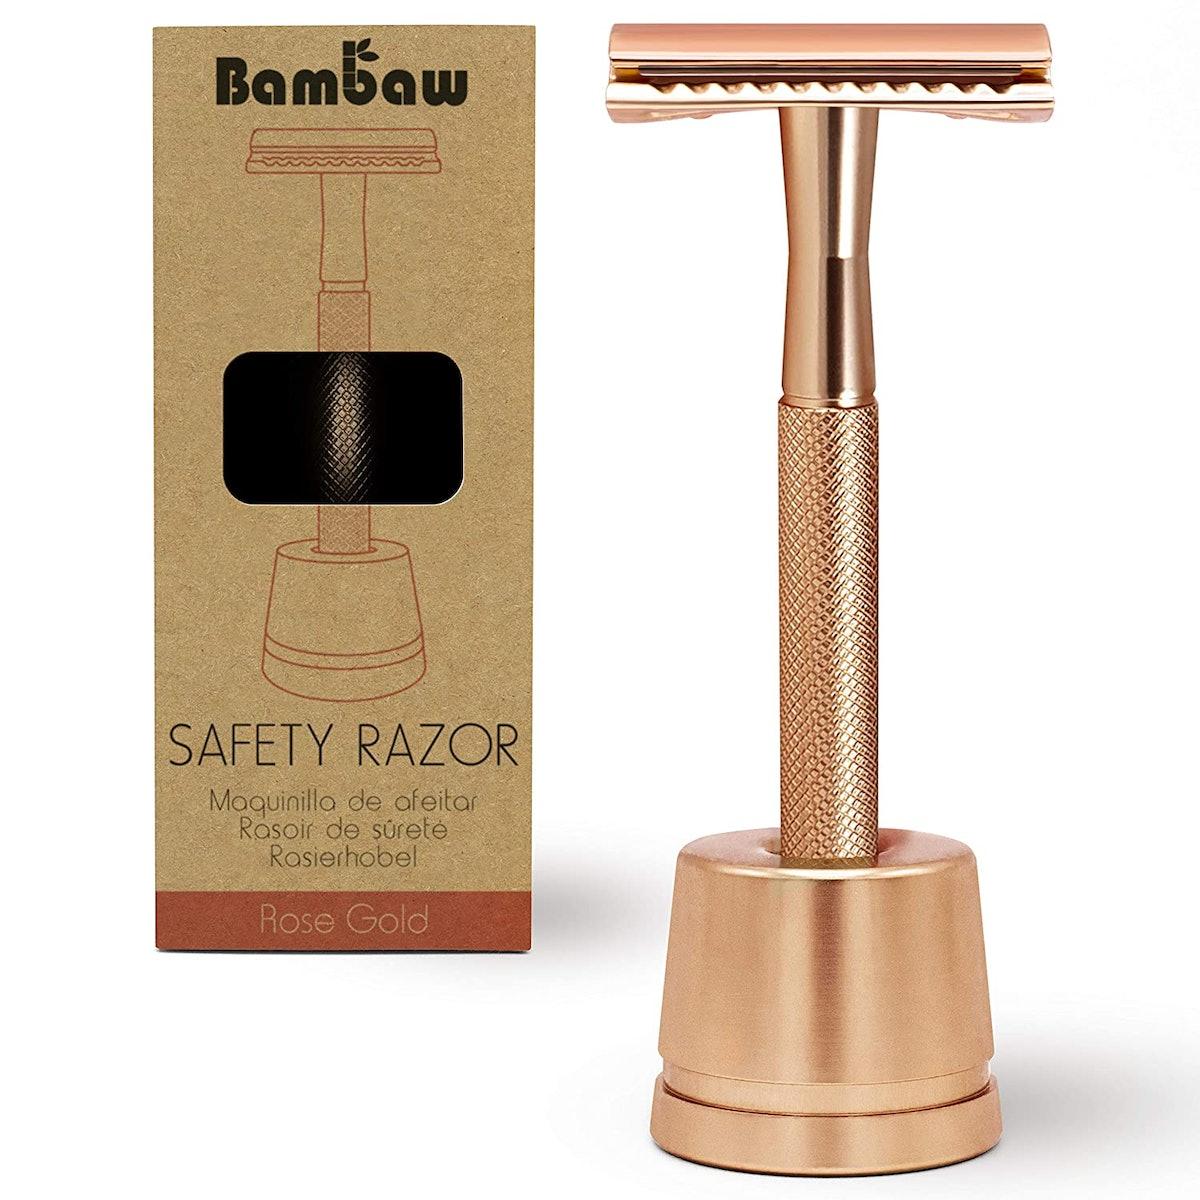 Bambaw Safety Razor